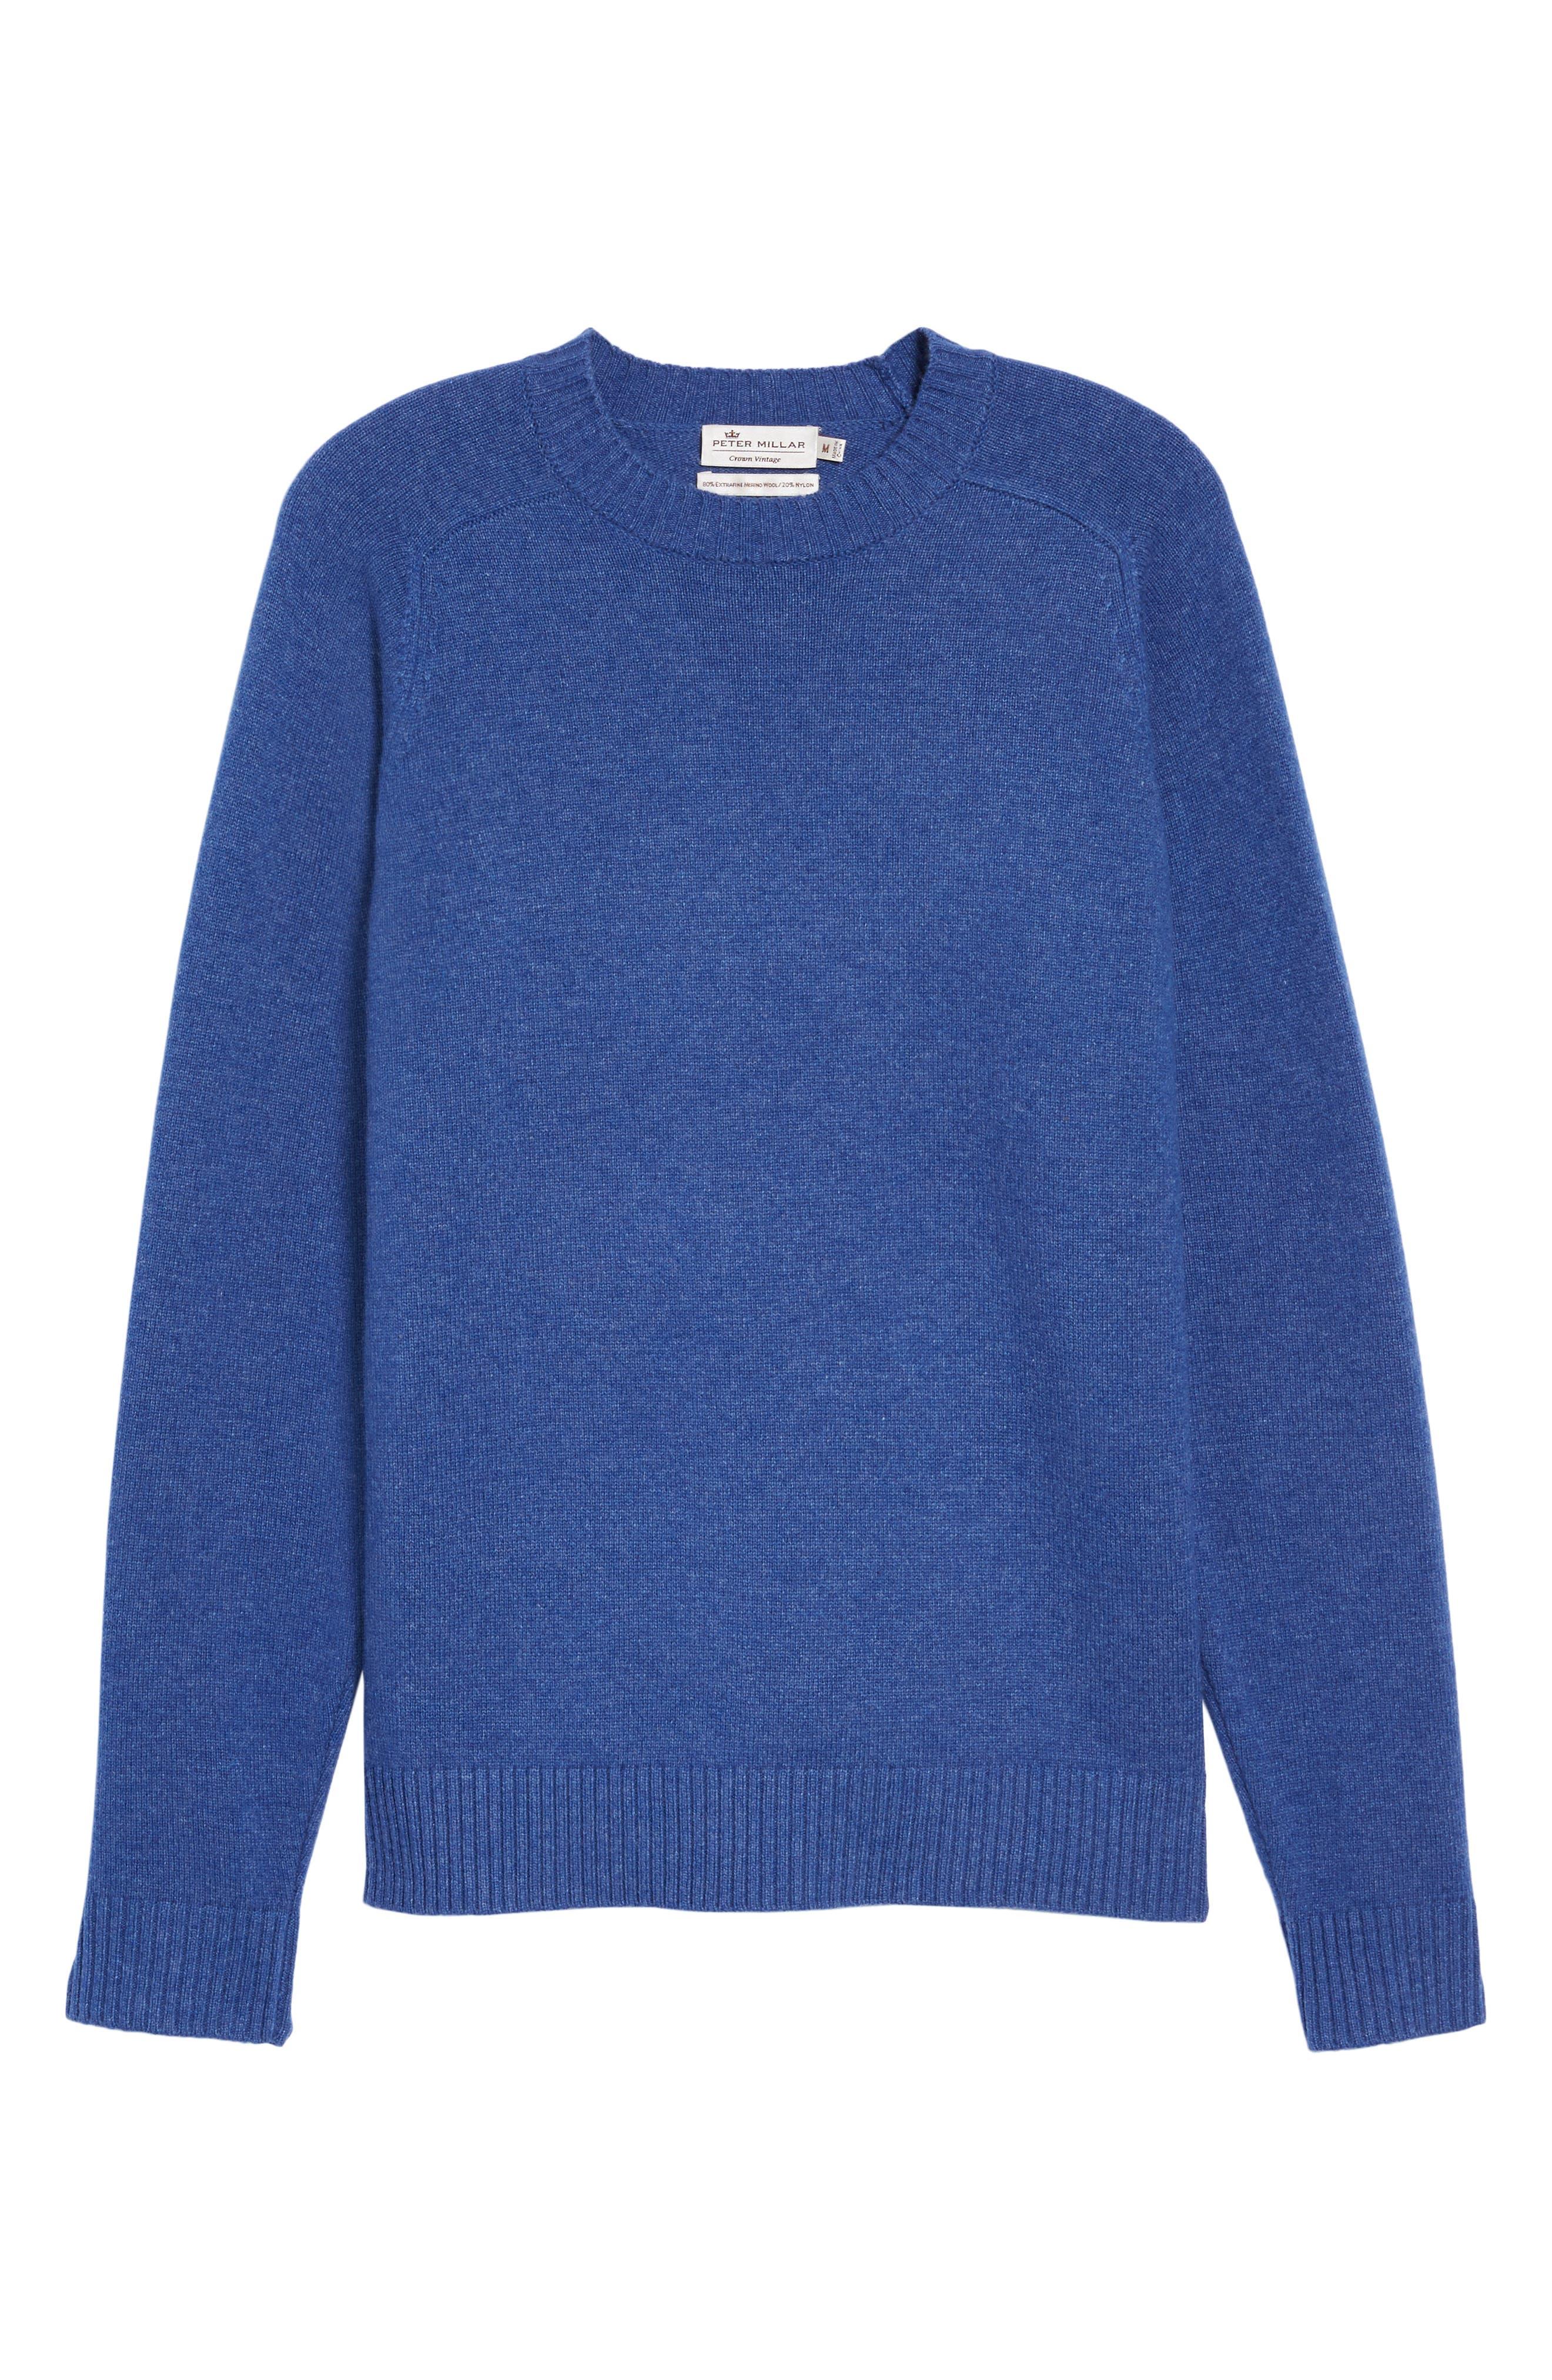 Alternate Image 5  - Peter Millar Crown Vintage Crewneck Sweatshirt